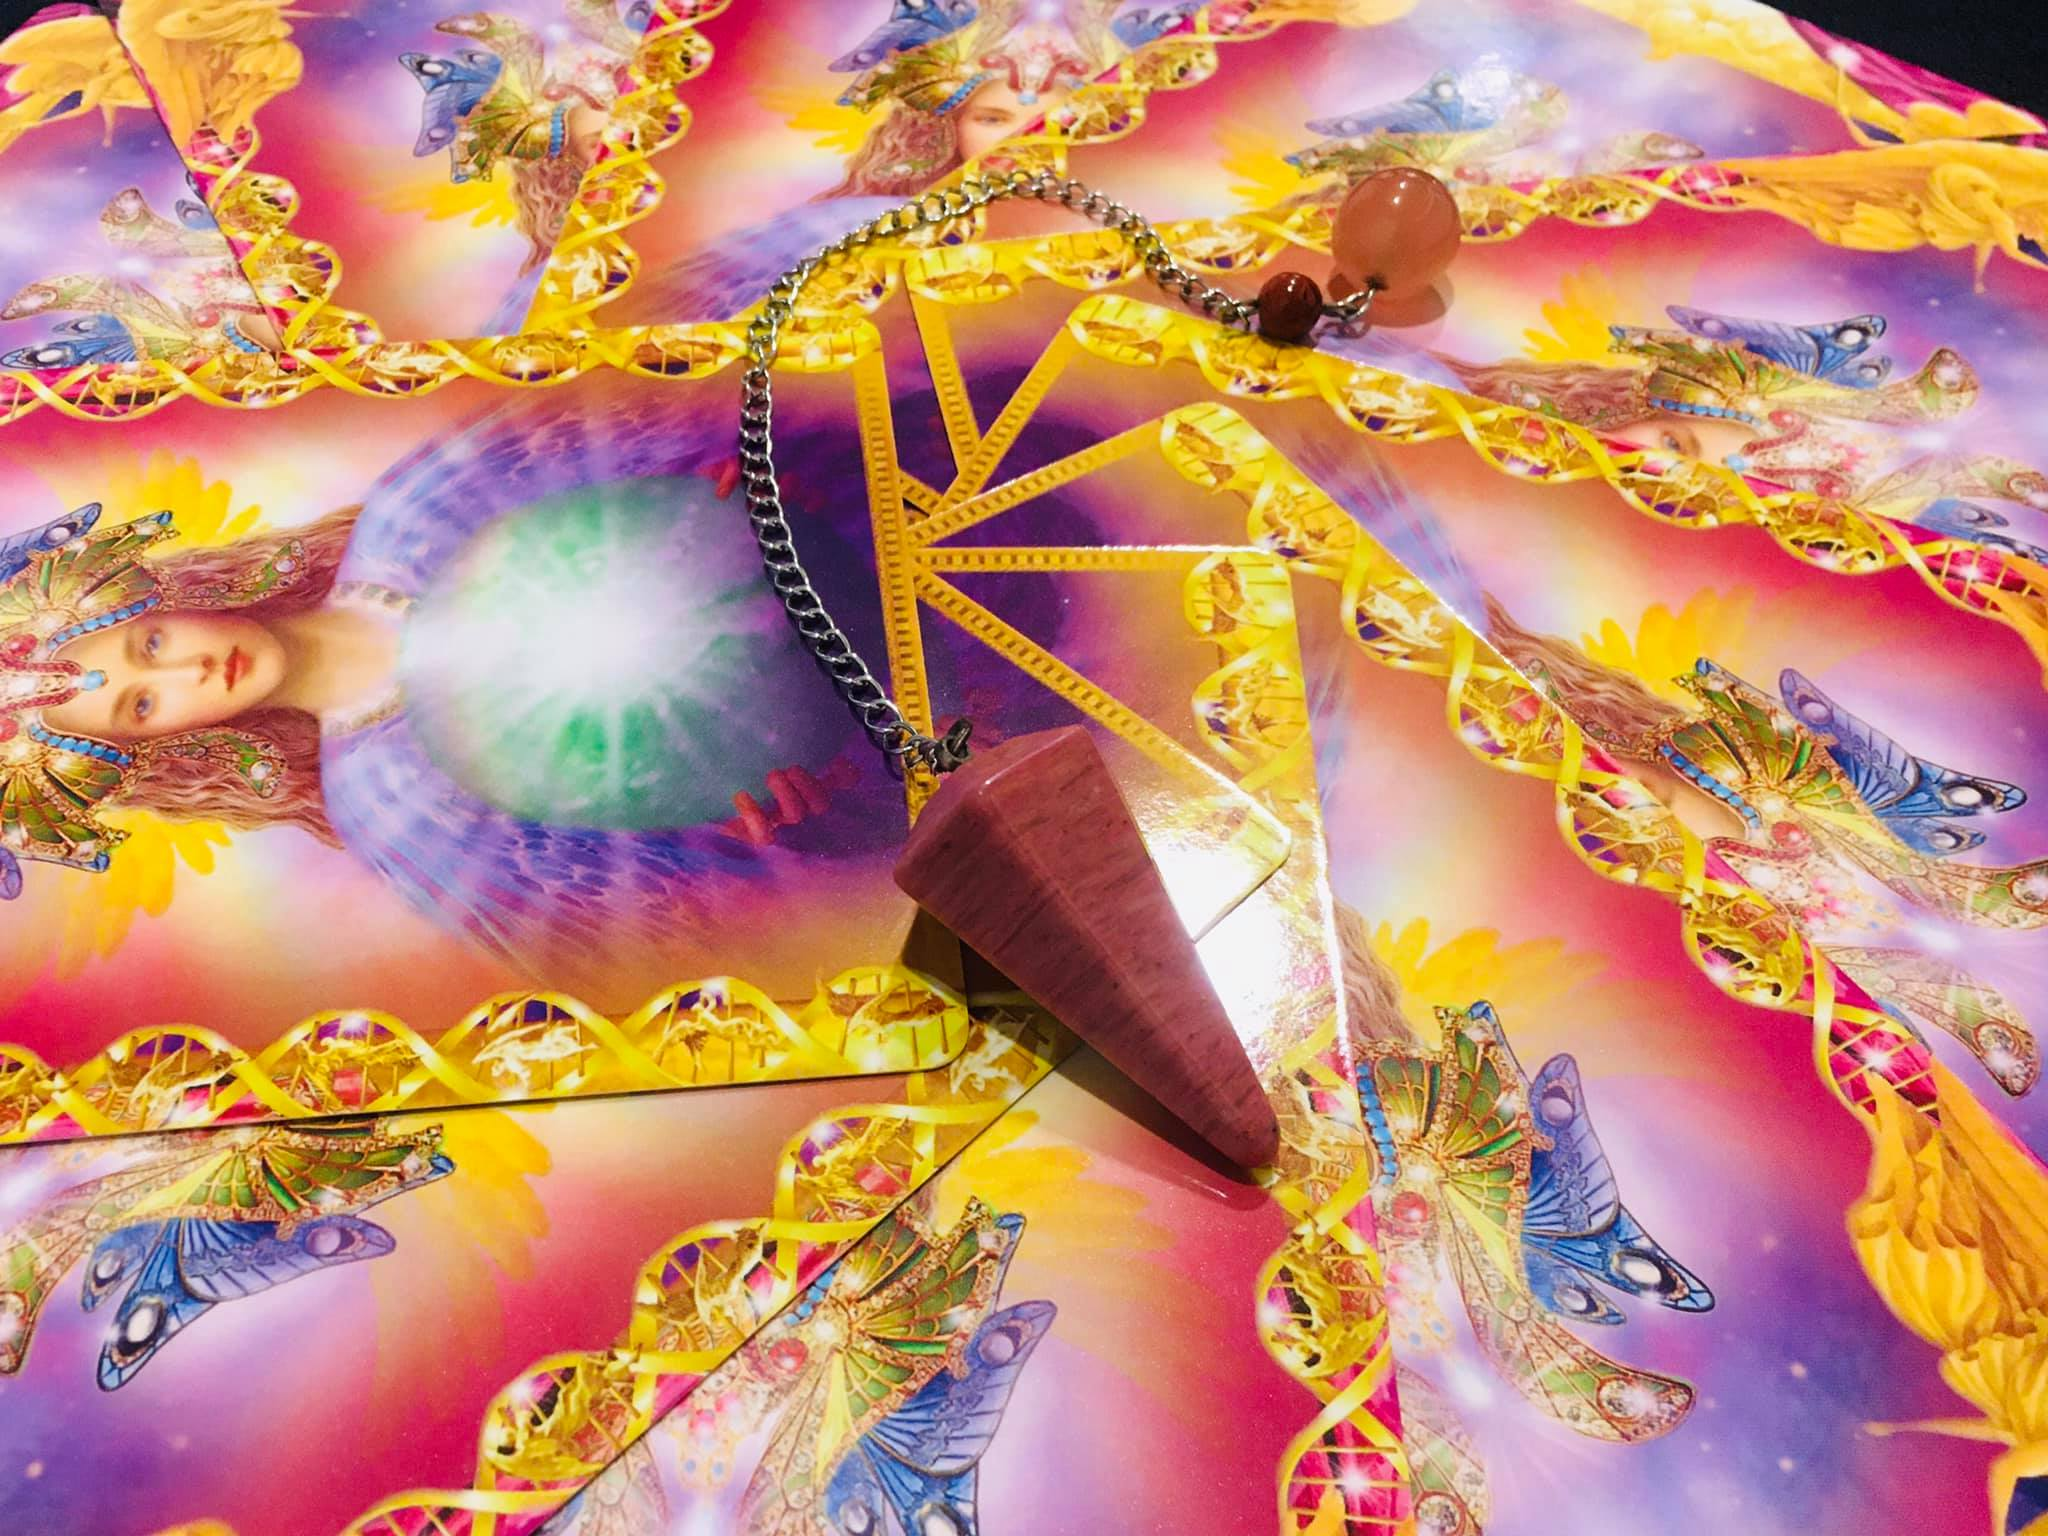 20210502 Shanti Pendulum Energy Blancing Healing for Improving Your Life